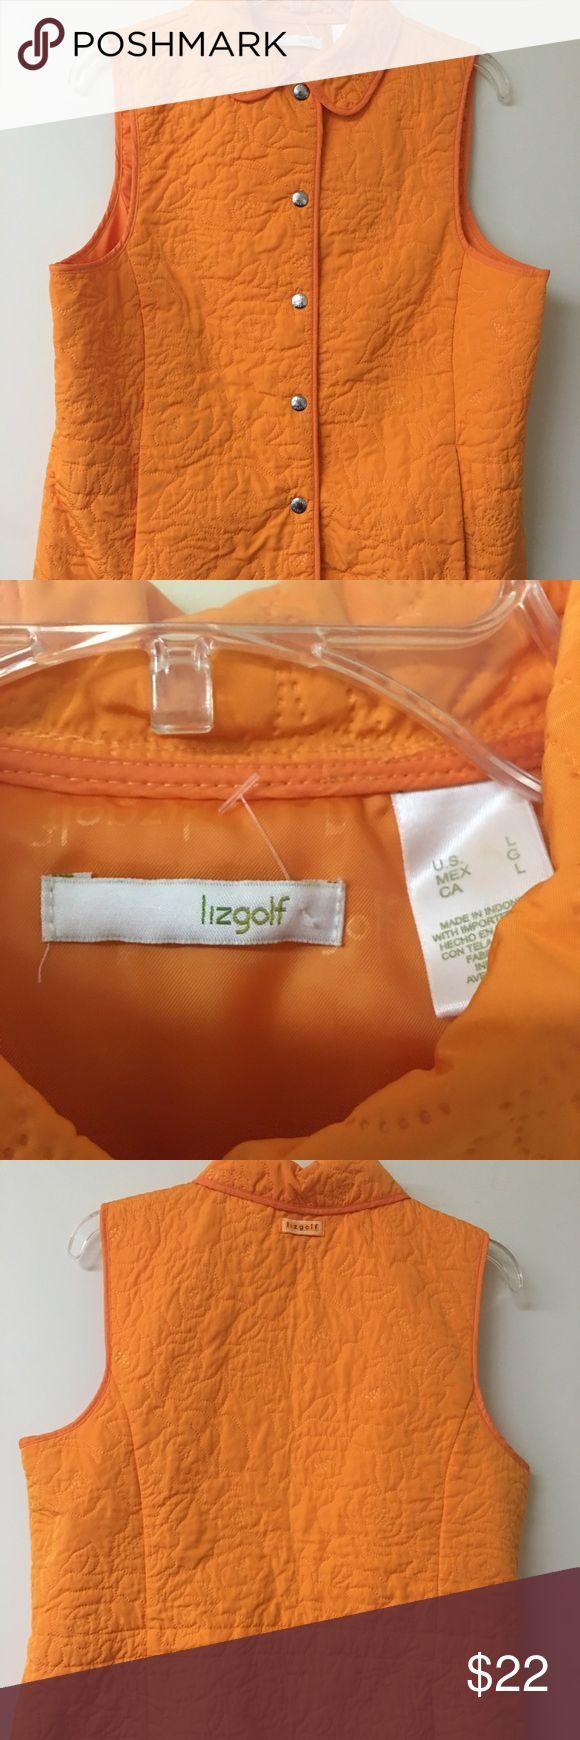 Lizgolf tangerine vest Size Large Beautiful lightweight sport vest new without tags Lizsport Jackets & Coats Vests